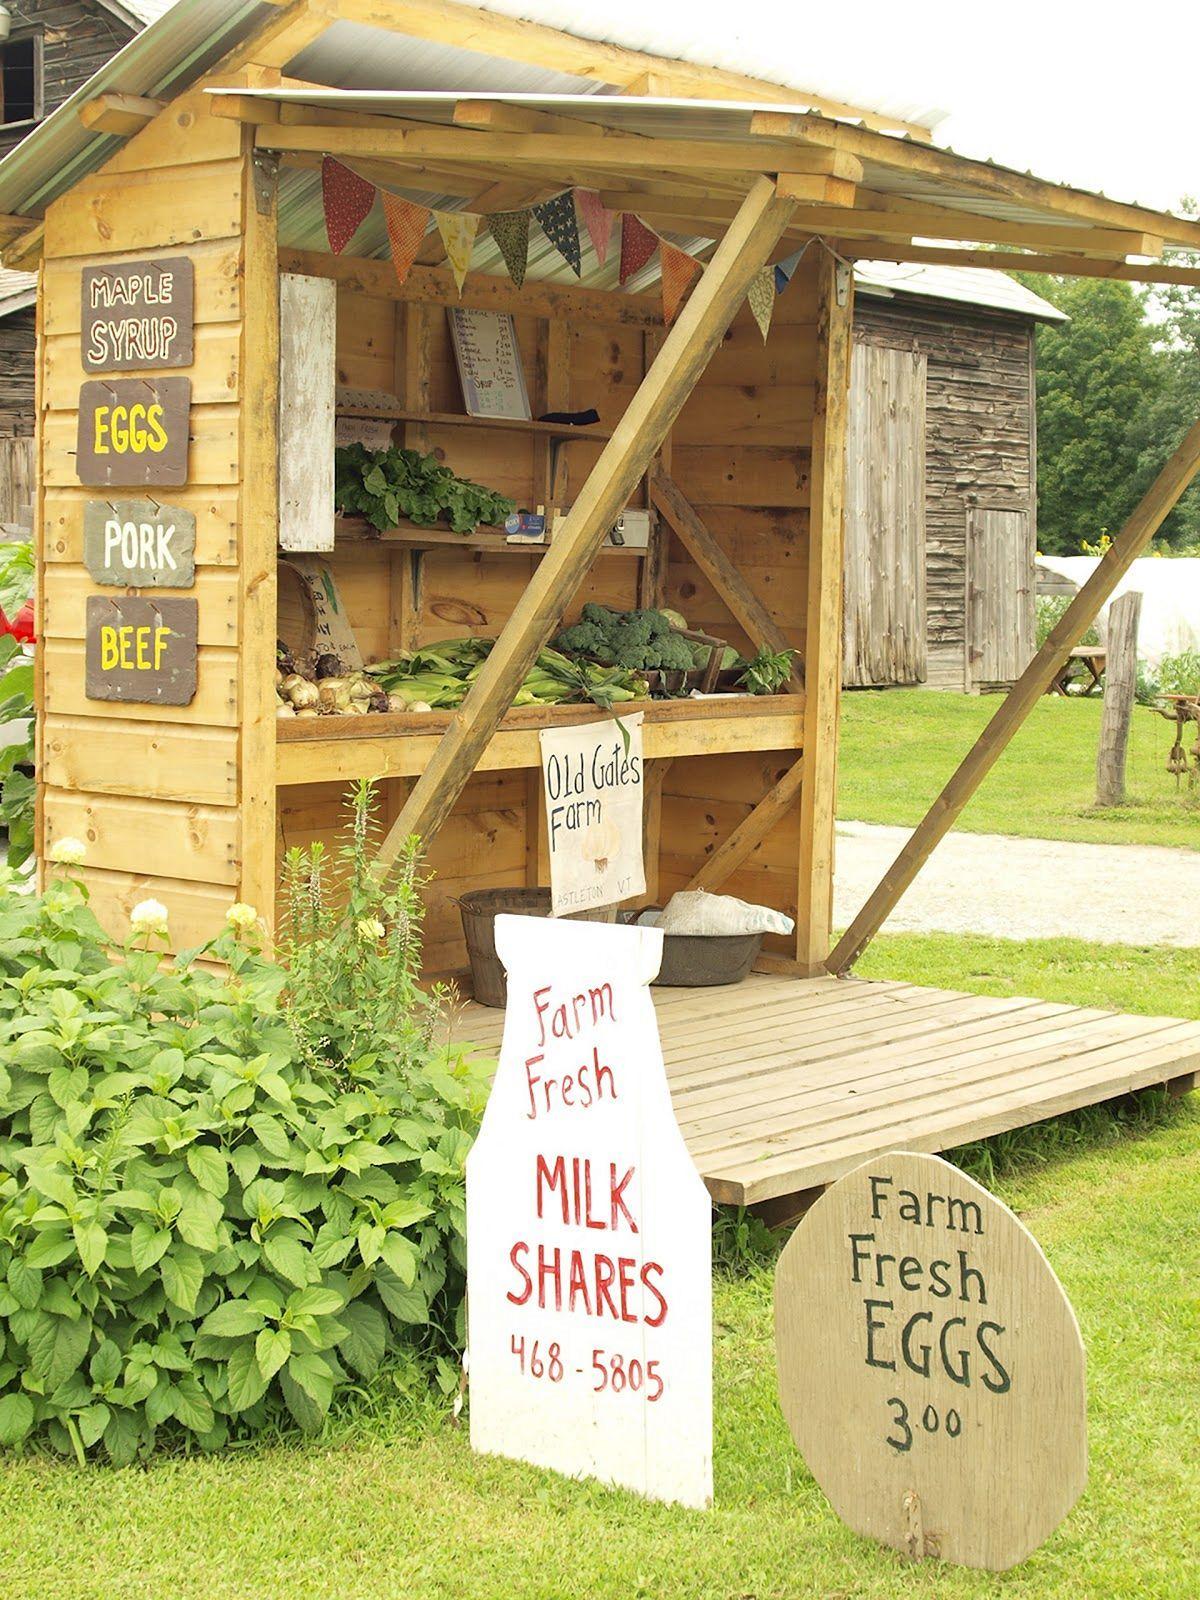 Epic Top 15 Wonderful Mini Farm Ideas You Have To See Https Freshouz Com Top 15 Wonderful Mini Farm Ideas You Have To See Farm Gardens Farm Stand Farm Shop